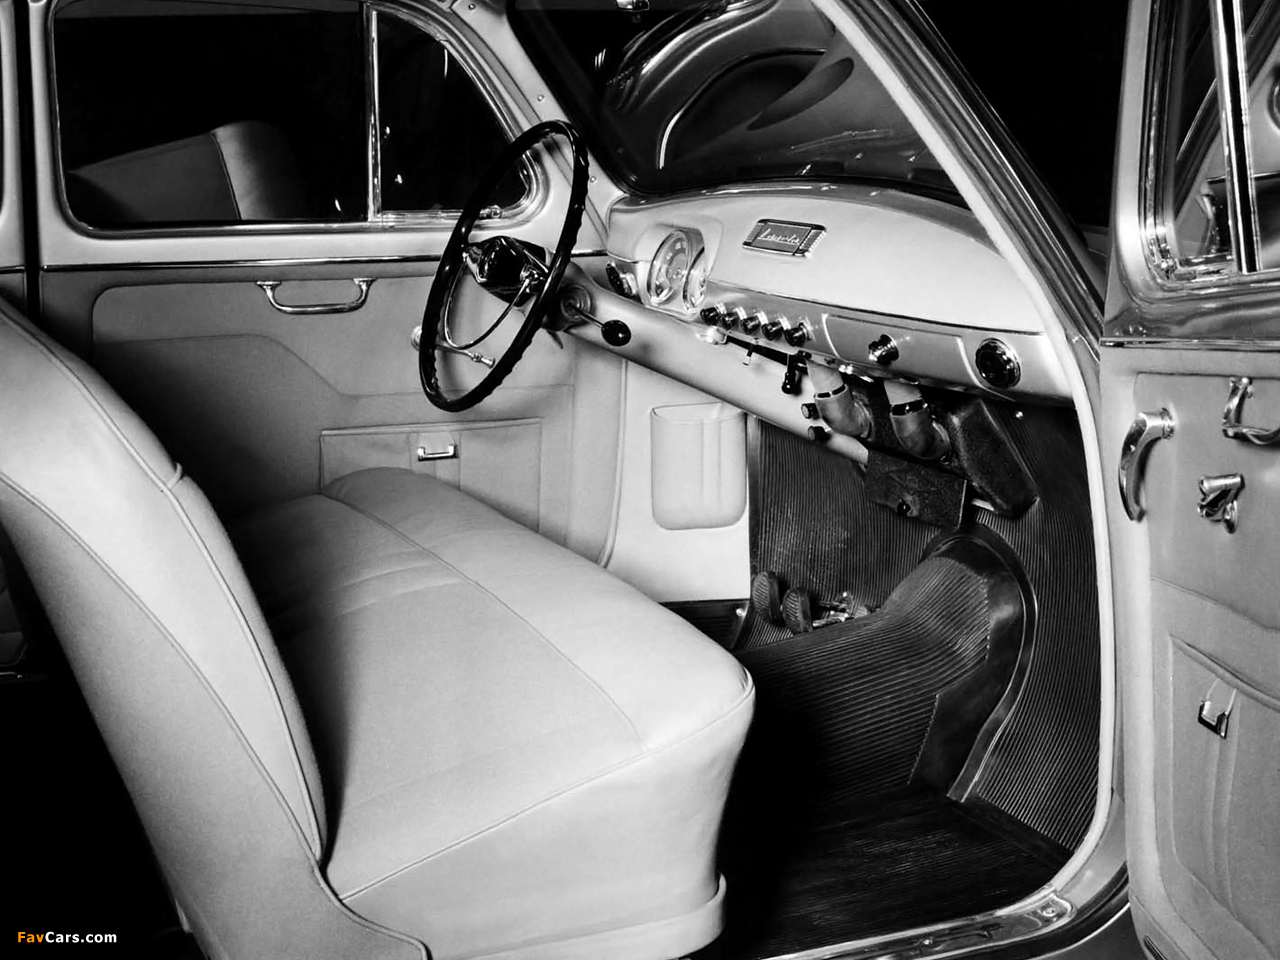 Lancia appia 2 serie c10 195659 pictures 1280x960 lancia appia 2 serie c10 195659 pictures 1280 x 960 vanachro Images